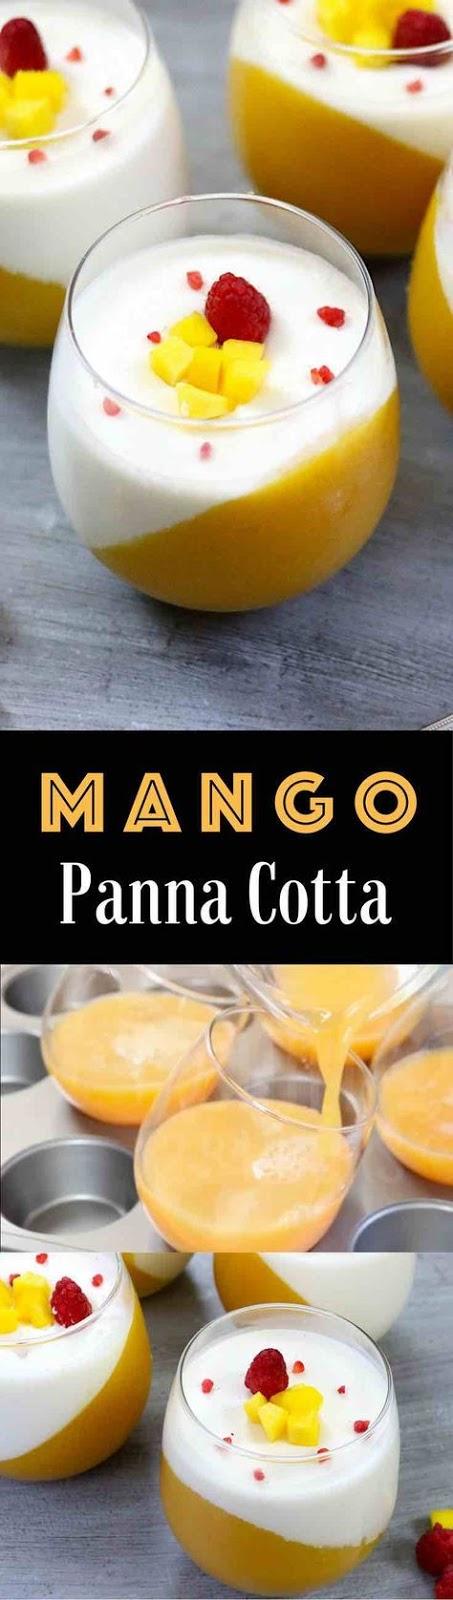 The Best Mango Panna Cotta